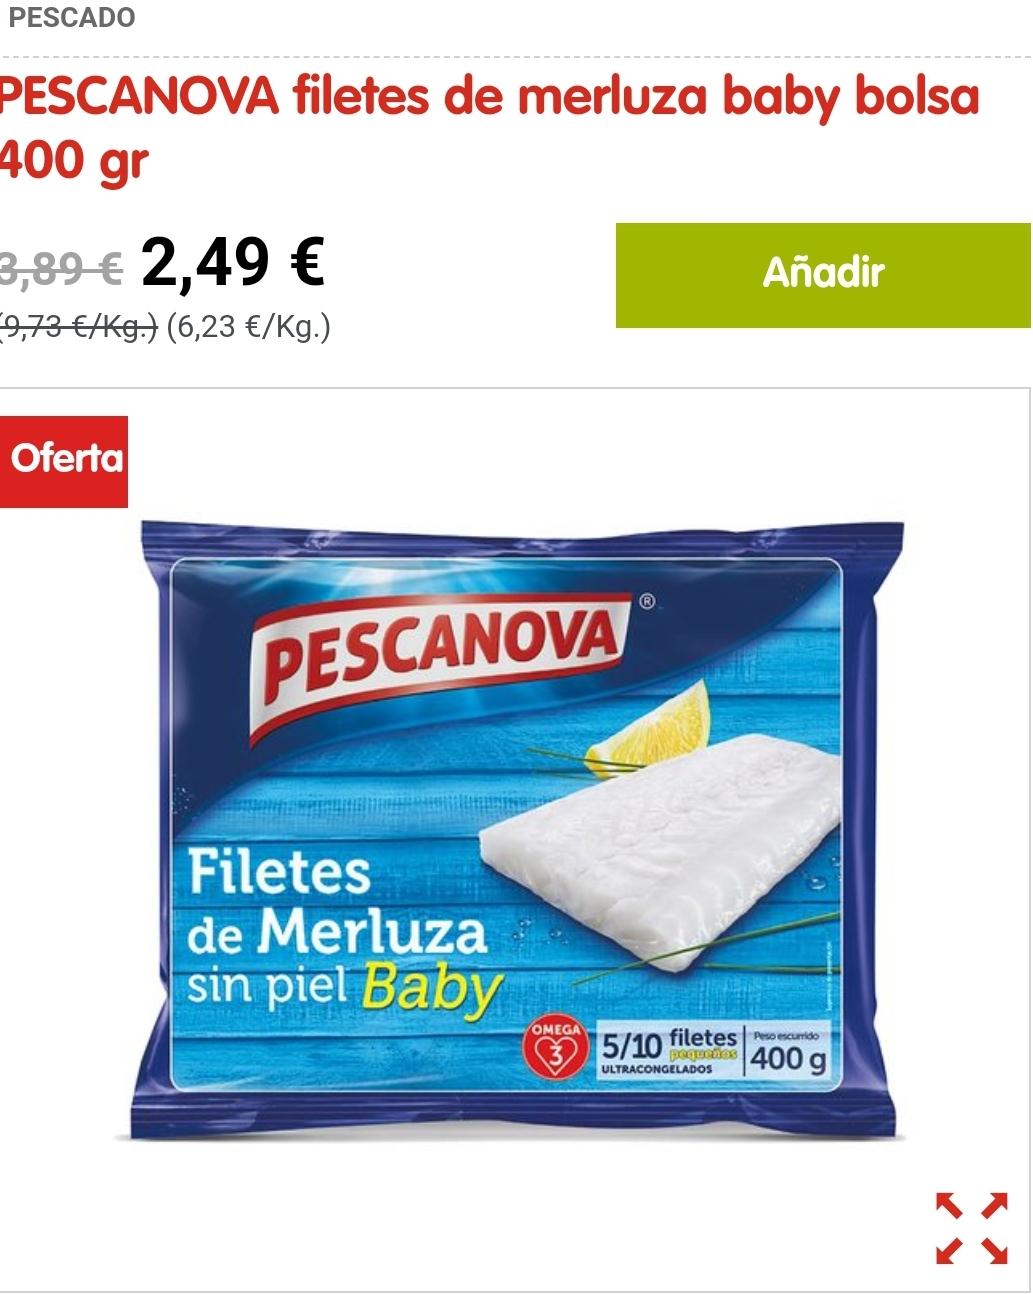 PESCANOVA filetes de merluza baby bolsa 400 gr